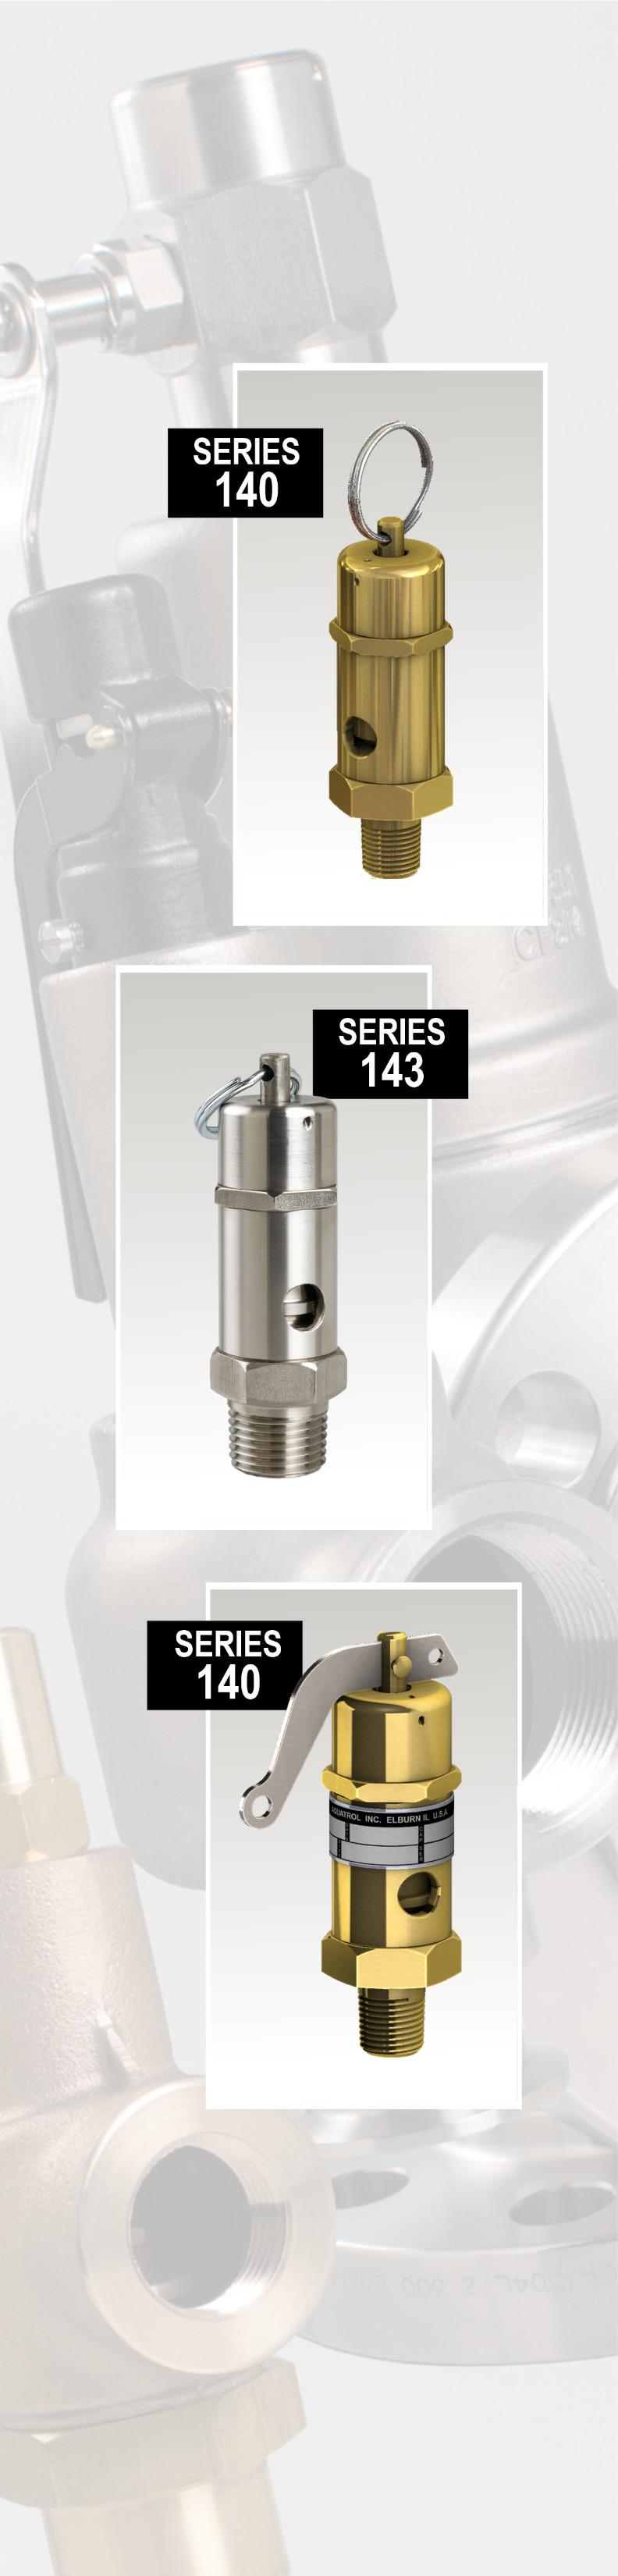 275 psi 1//2 x 1 1//2 x 1 AQUATROL 740DD-M2L-275 Series 740 Safety Relief Valve